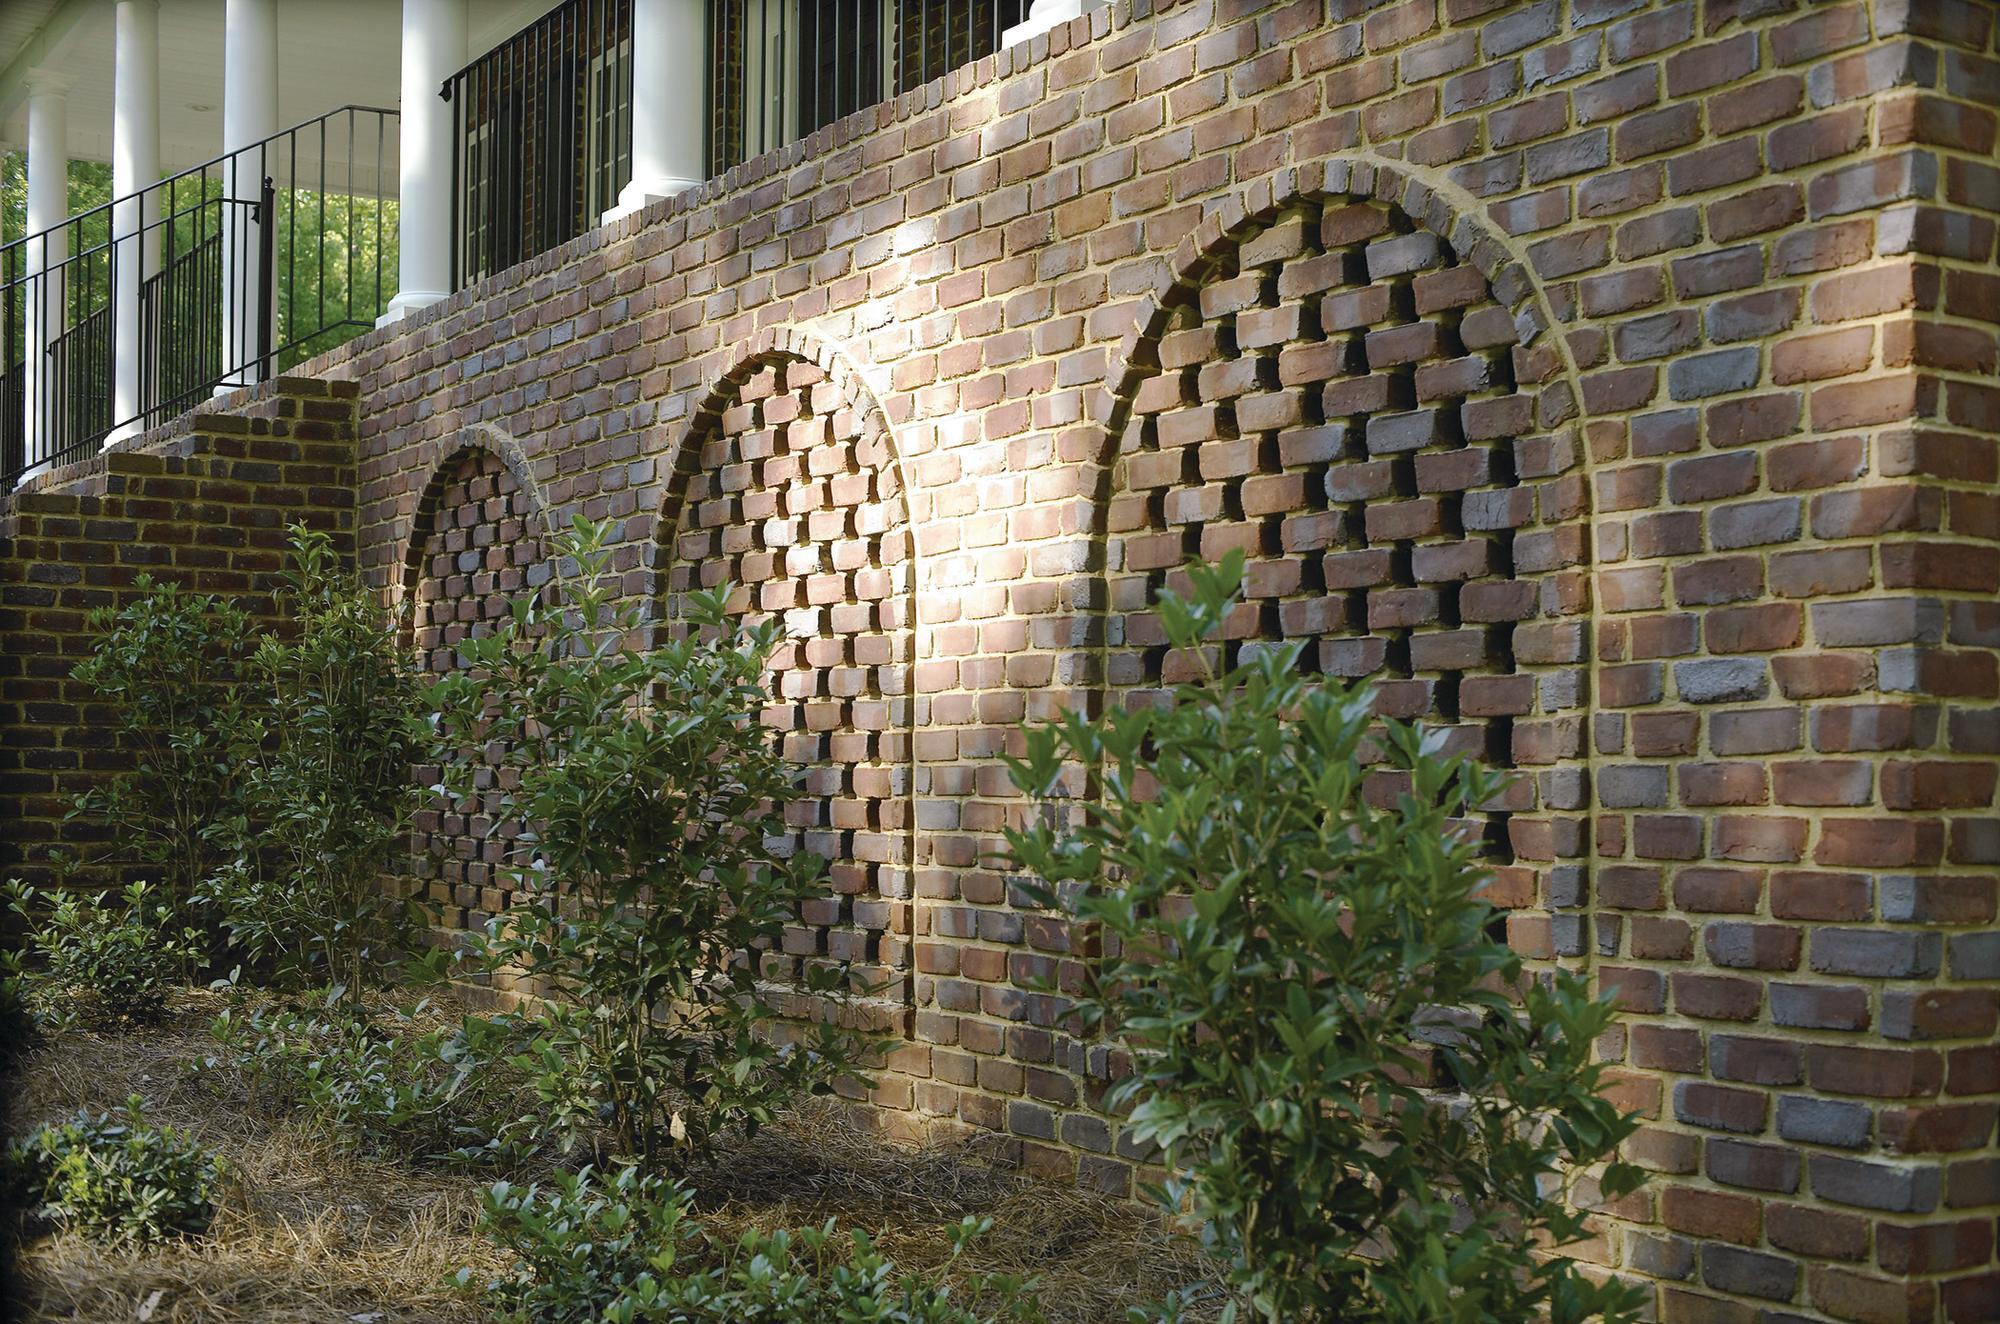 Boral Bricks 17th Century Bricks Collection Remodeling